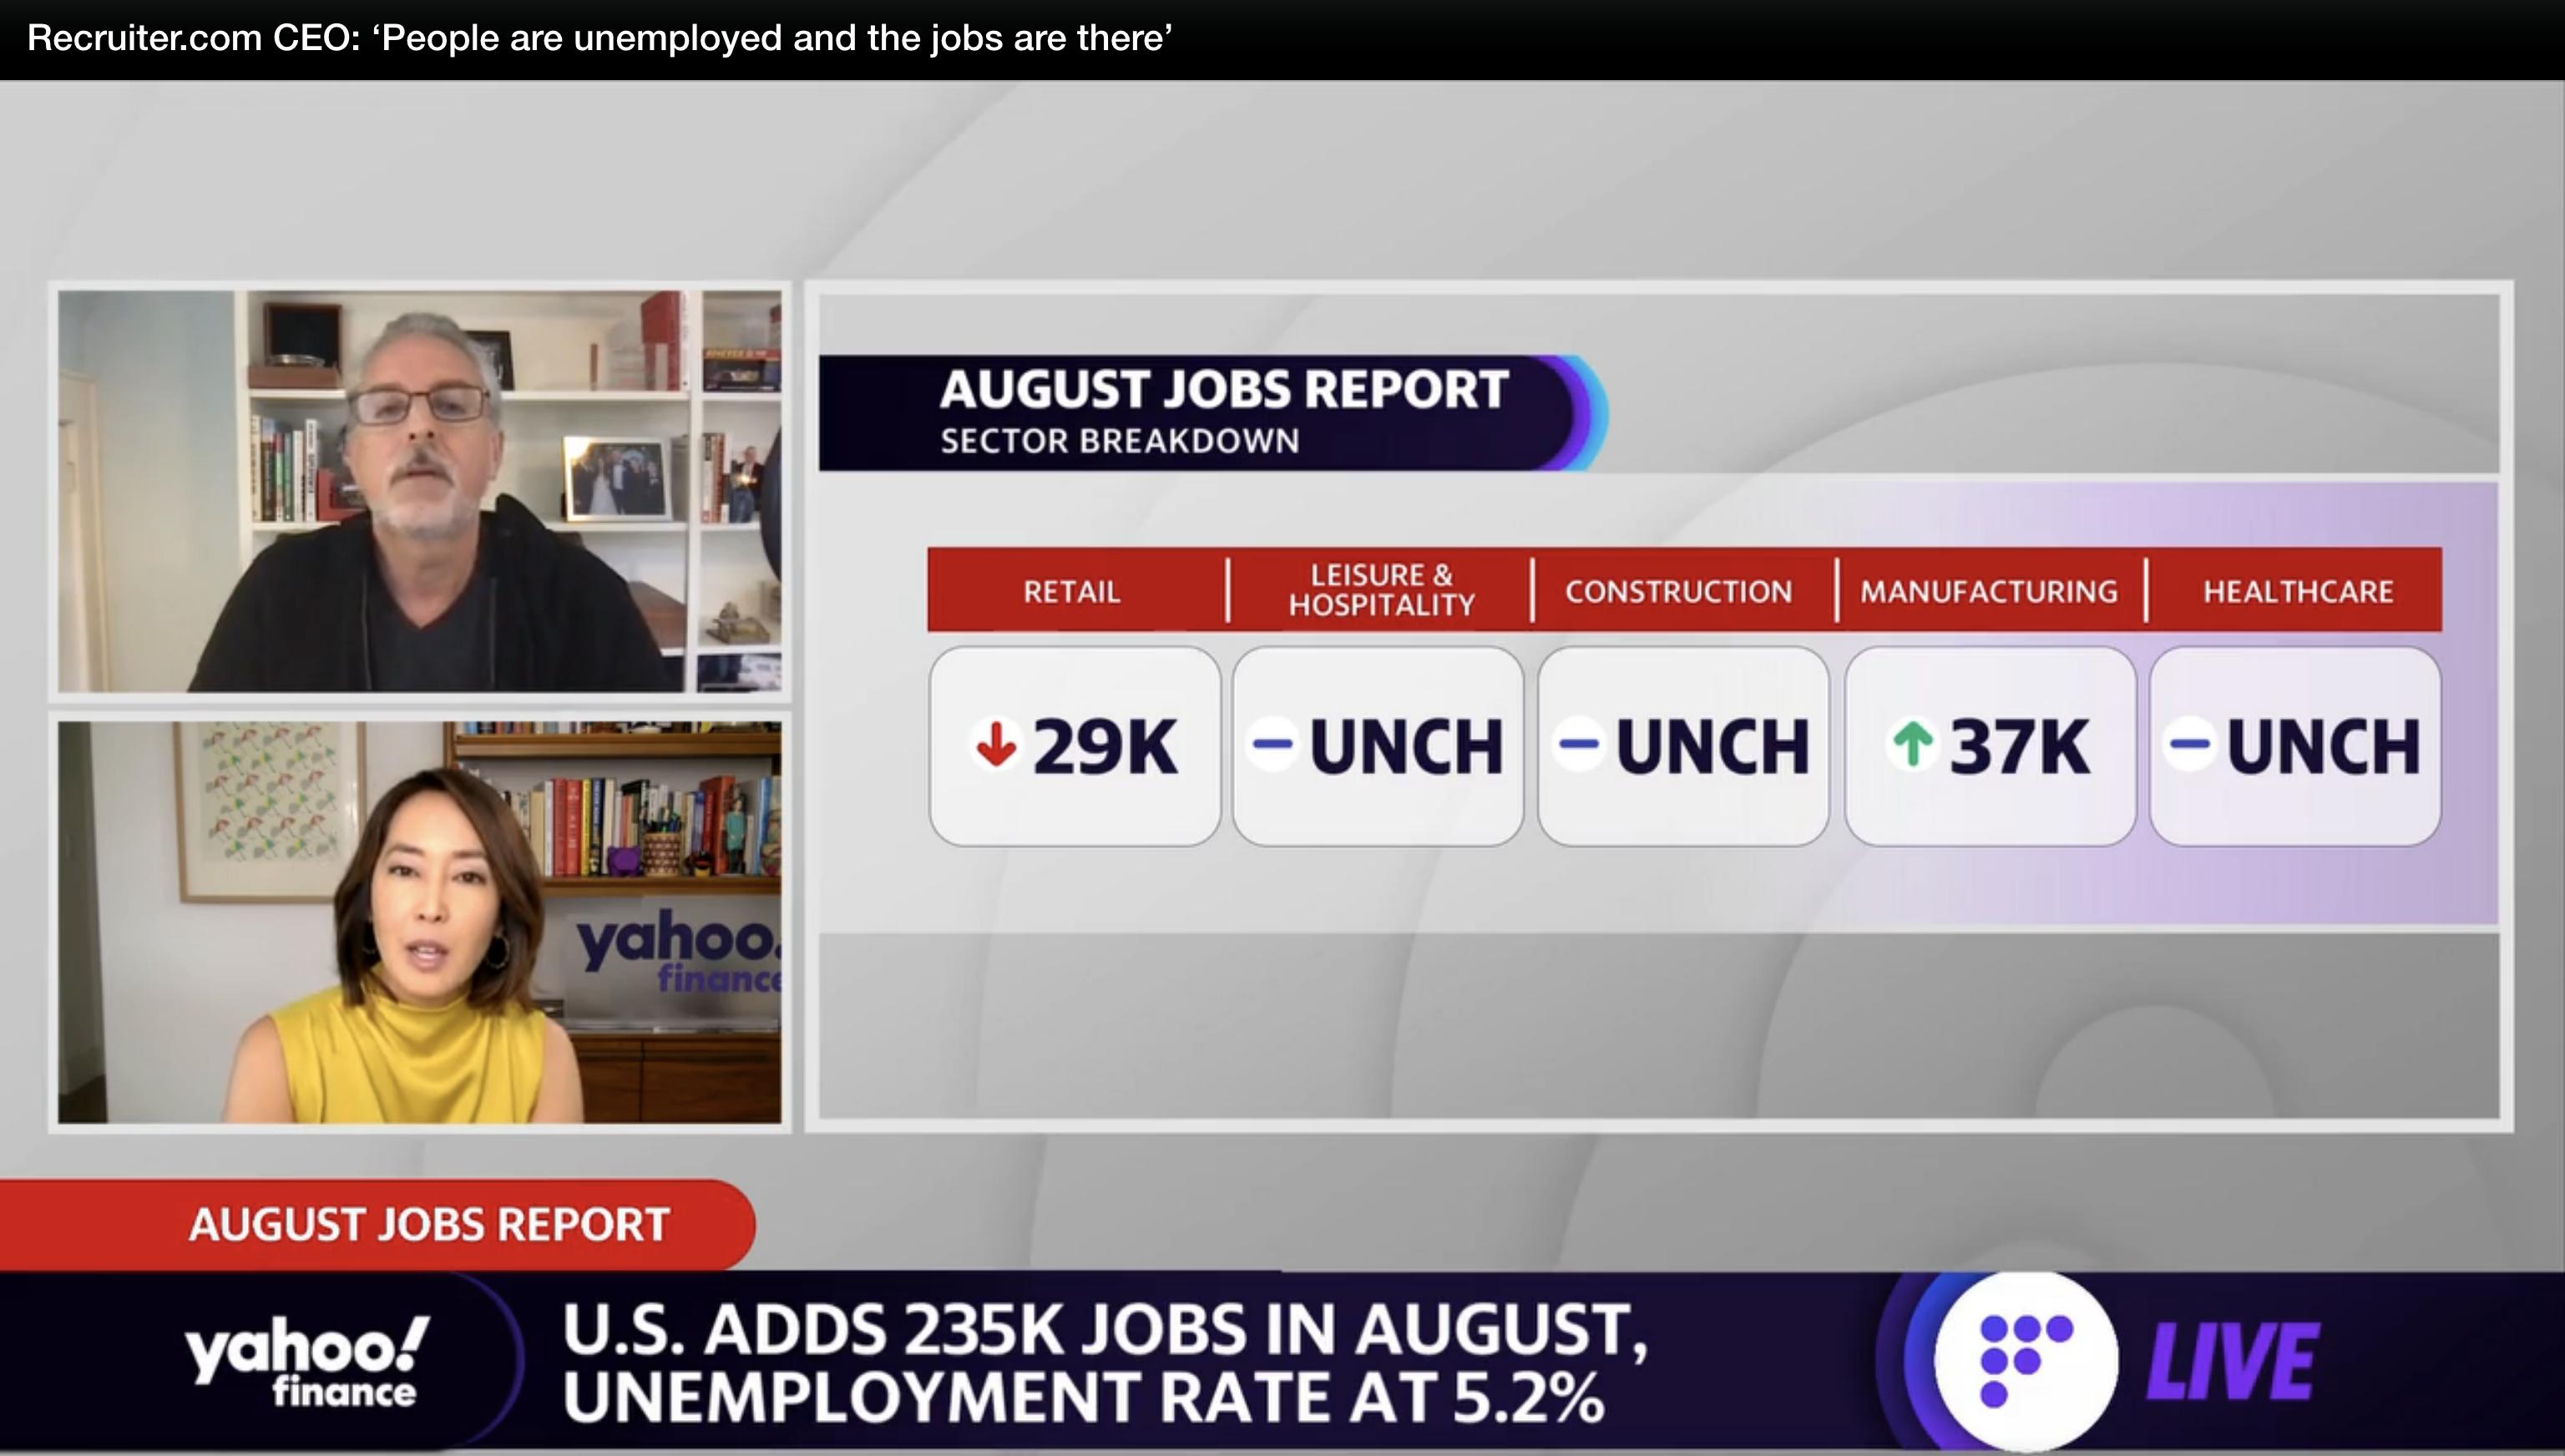 Recruiter.com on Yahoo Finance